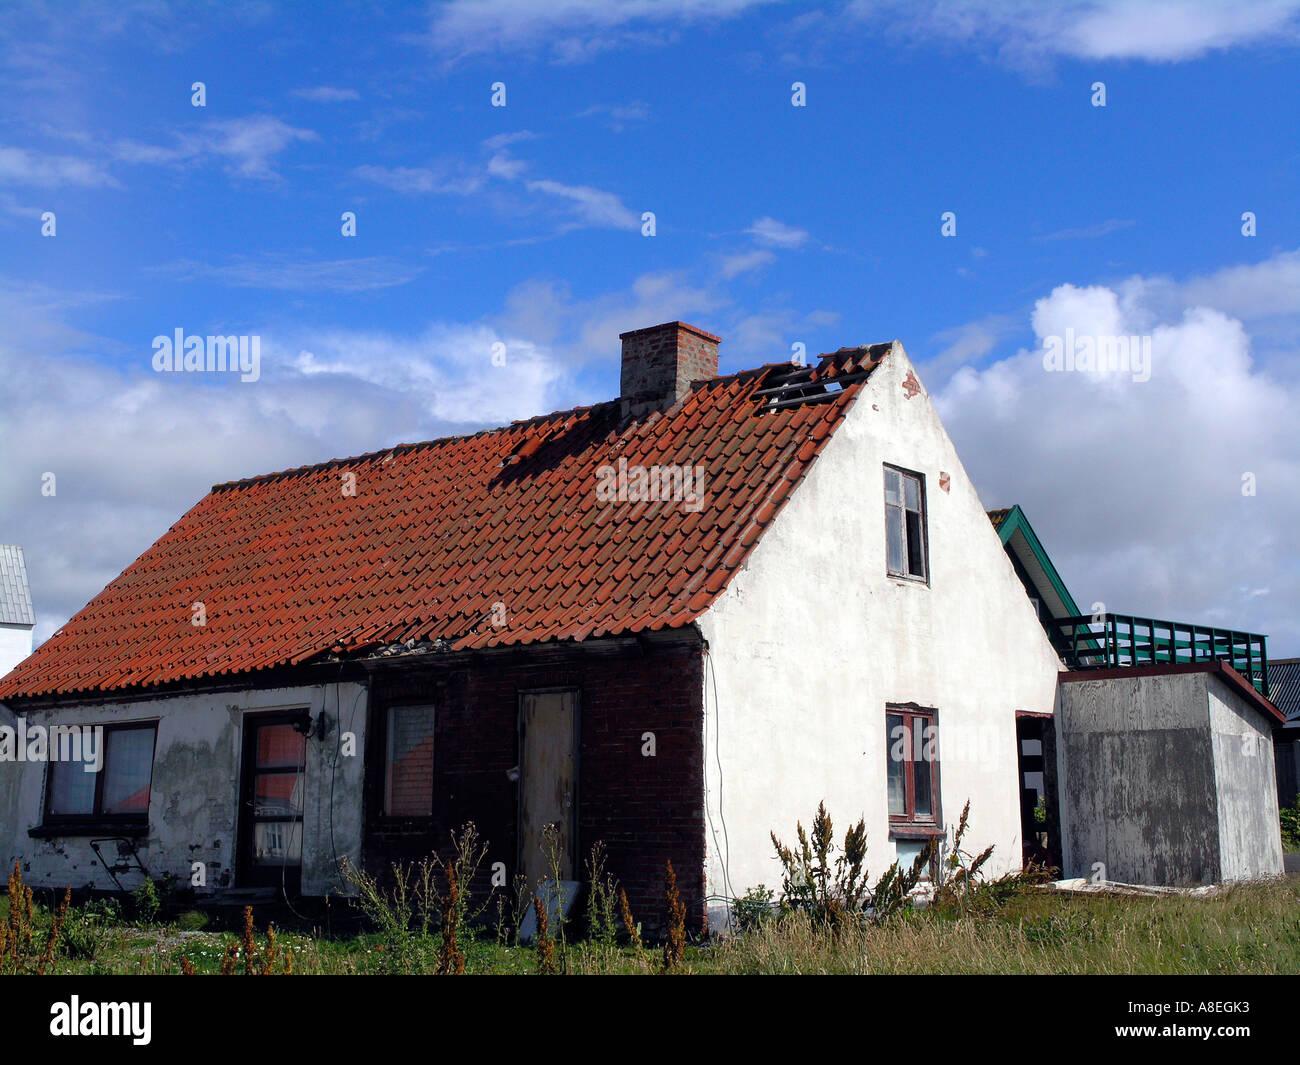 Cottage in disrepair - Stock Image